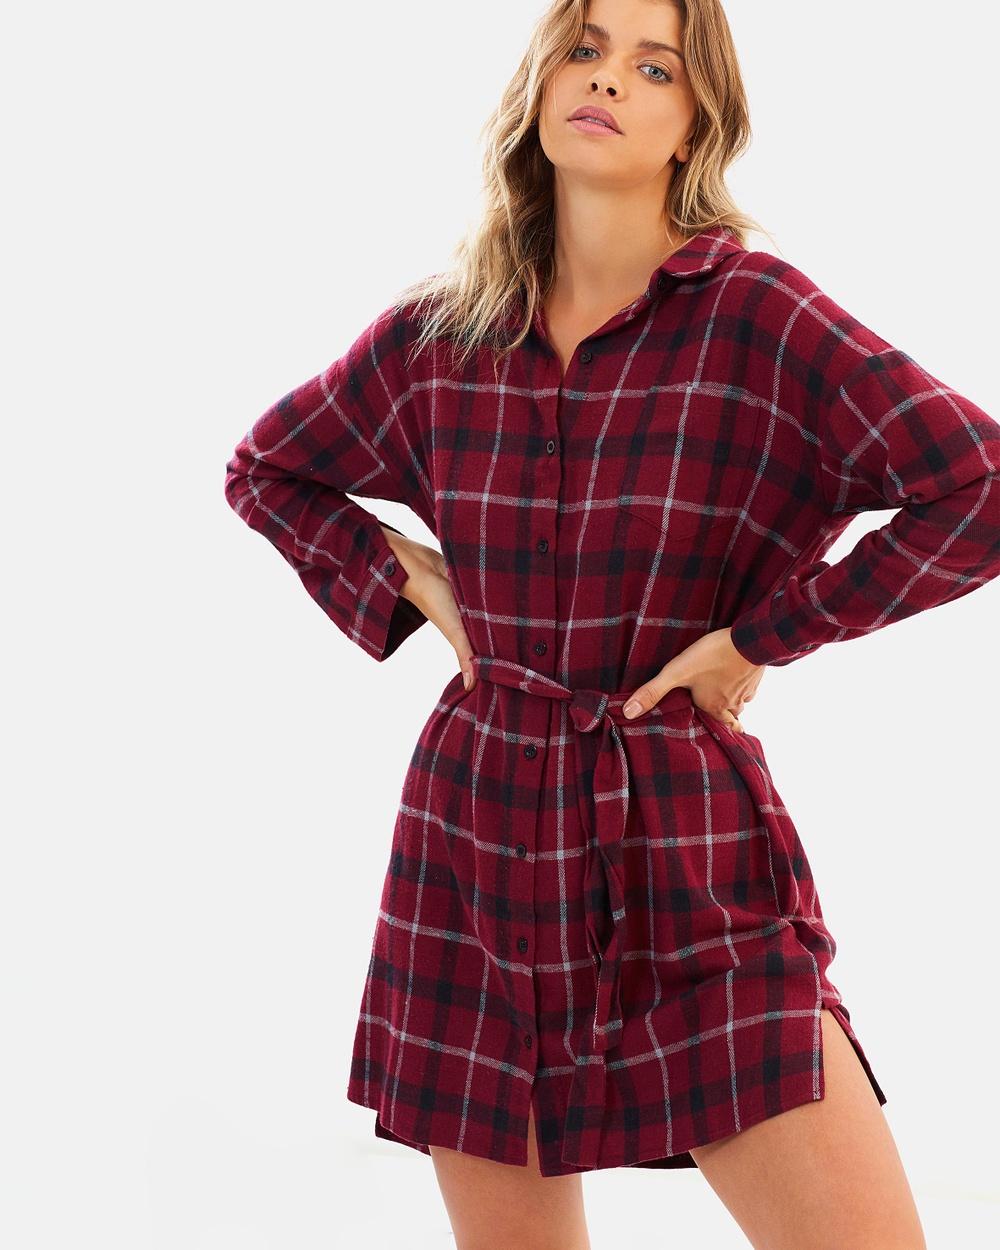 Atmos & Here ICONIC EXCLUSIVE Sahara Shirt Dress Dresses Red Check ICONIC EXCLUSIVE Sahara Shirt Dress